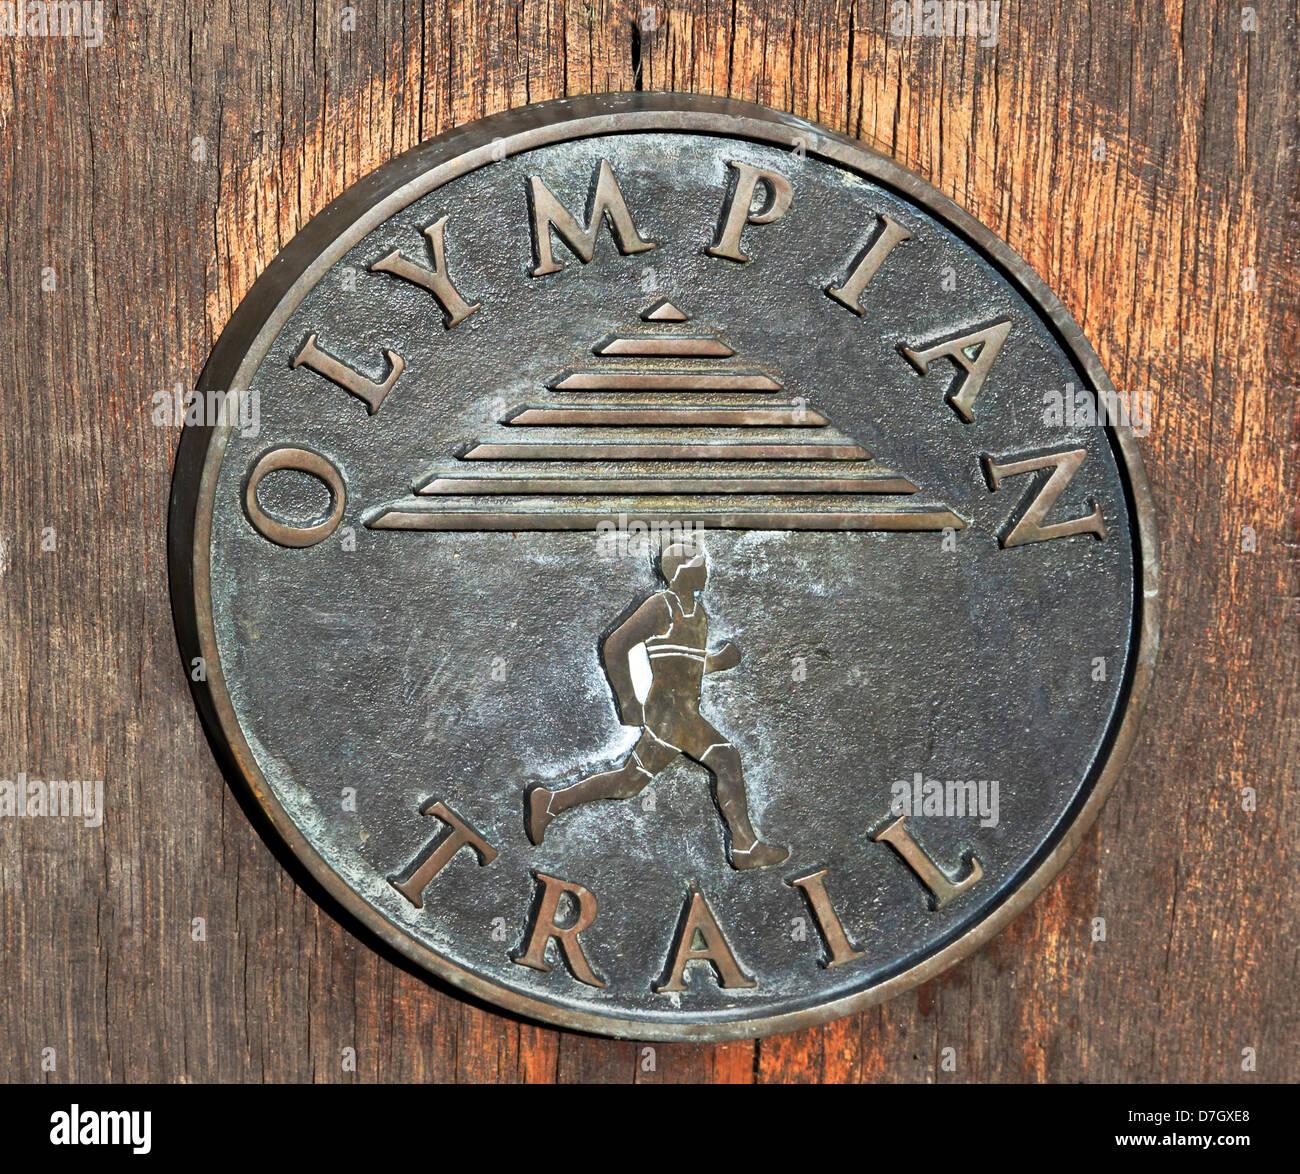 8904. Olympian Trail, Much Wenlock,. Shropshire, England, UK - Stock Image